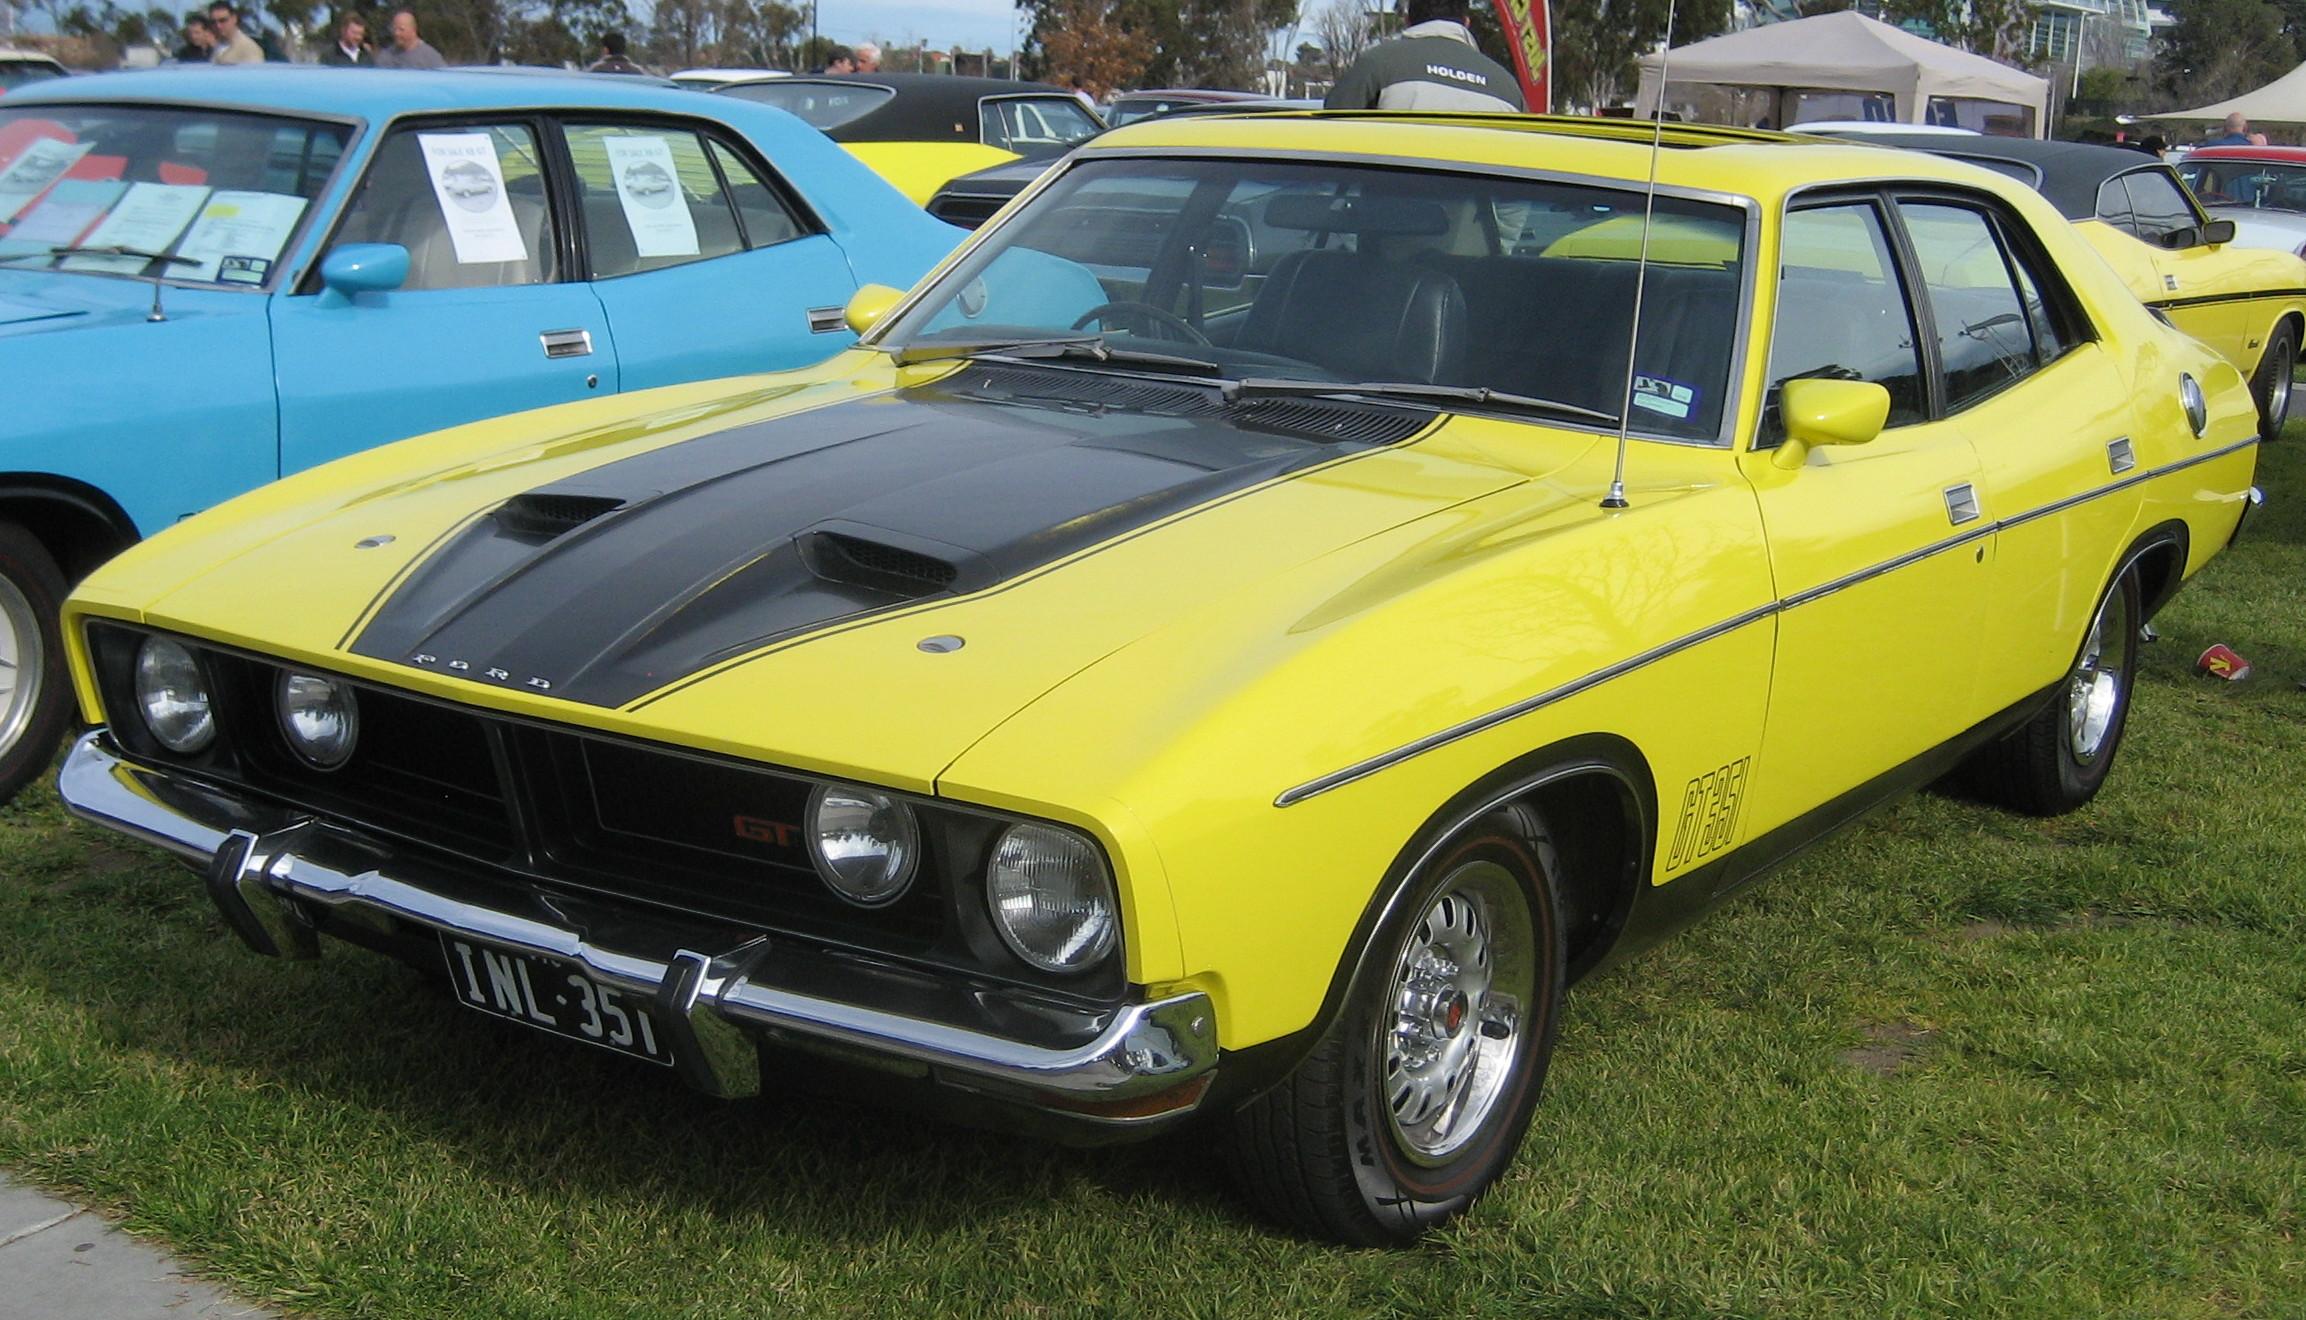 File Ford Falcon Xb Gt Sedan Yellow Blaze Jpg Wikimedia